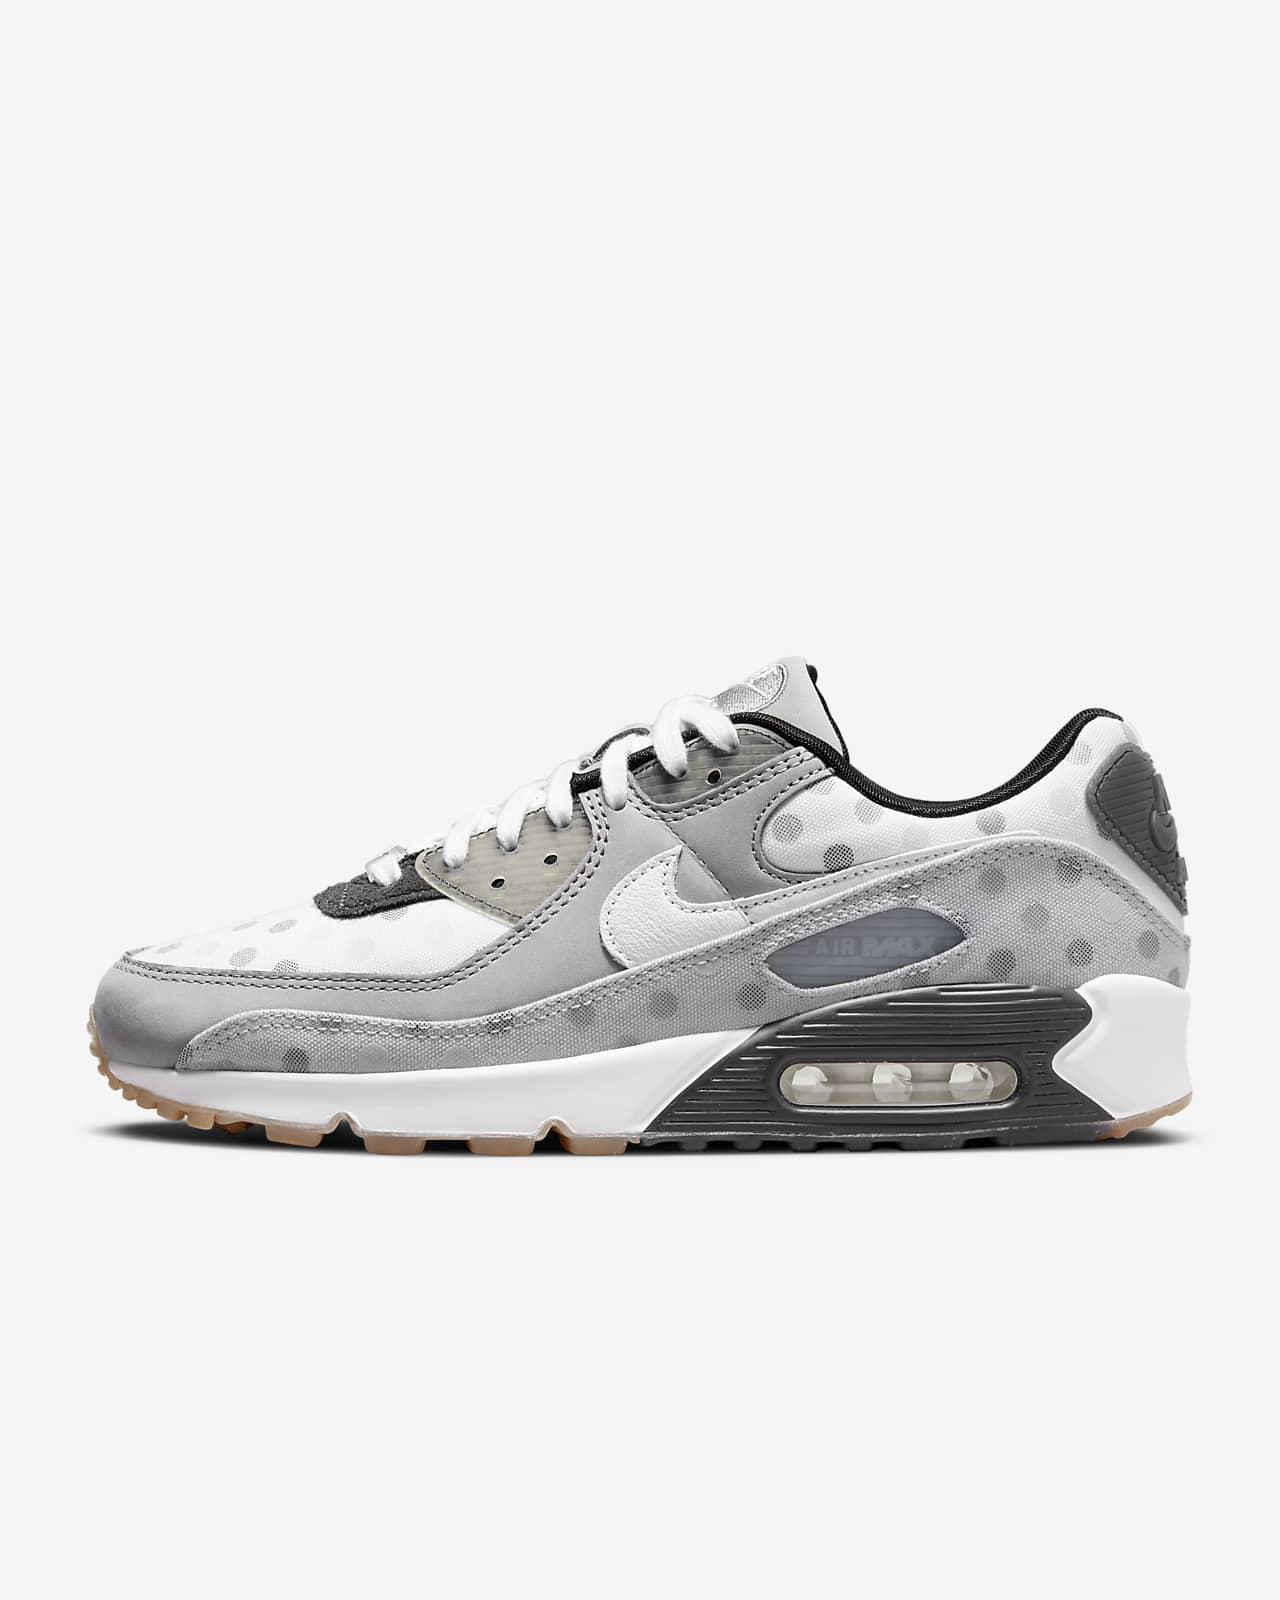 Nike Air Max 90 NRG Men's Shoes